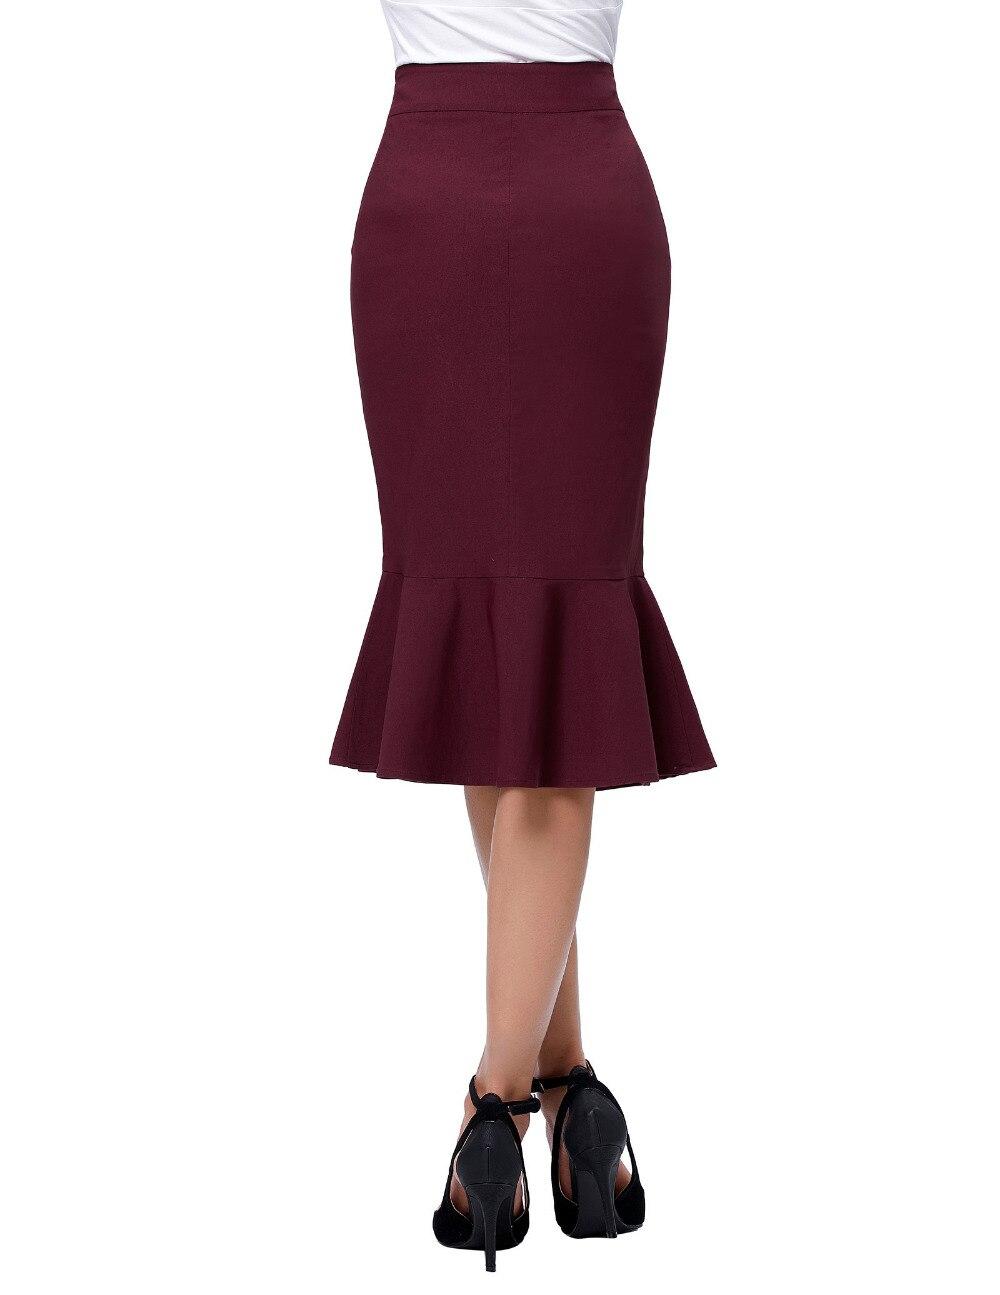 17 Skirts Faldas Women's Fashion OL Casual Mermaid Dark Wine Black Pencil Skirt Jupe Longue High Waist Sexy Long Skirt 3